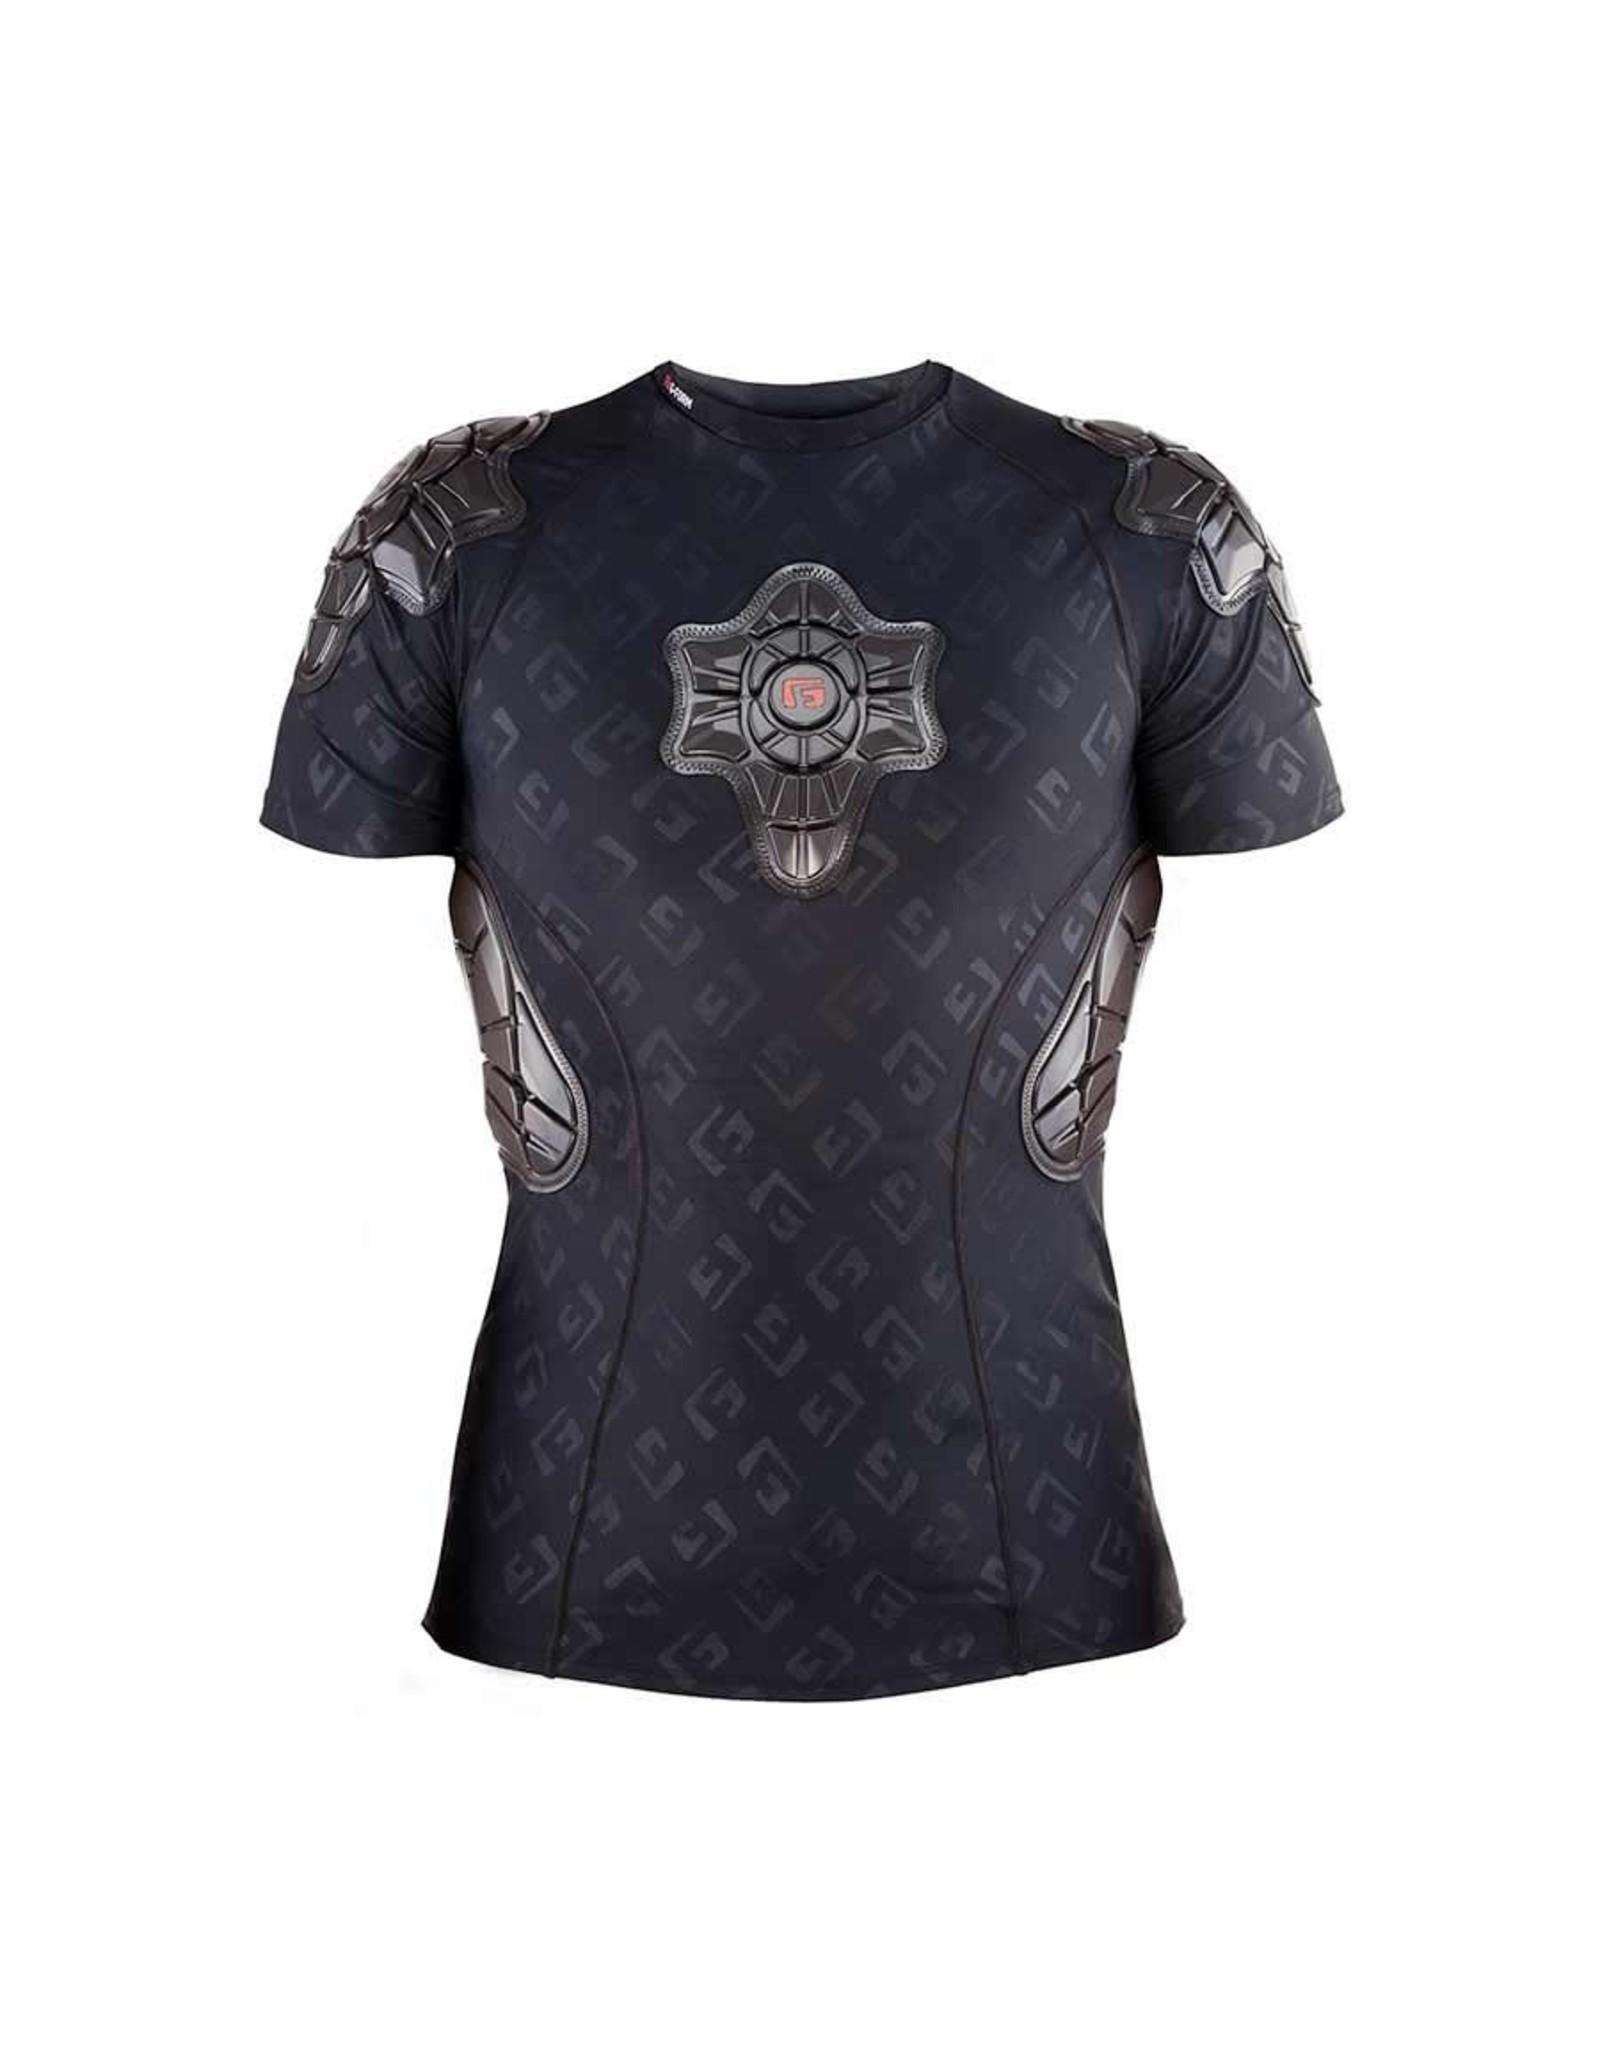 G-Form Shirt G-Form Pro-X men black